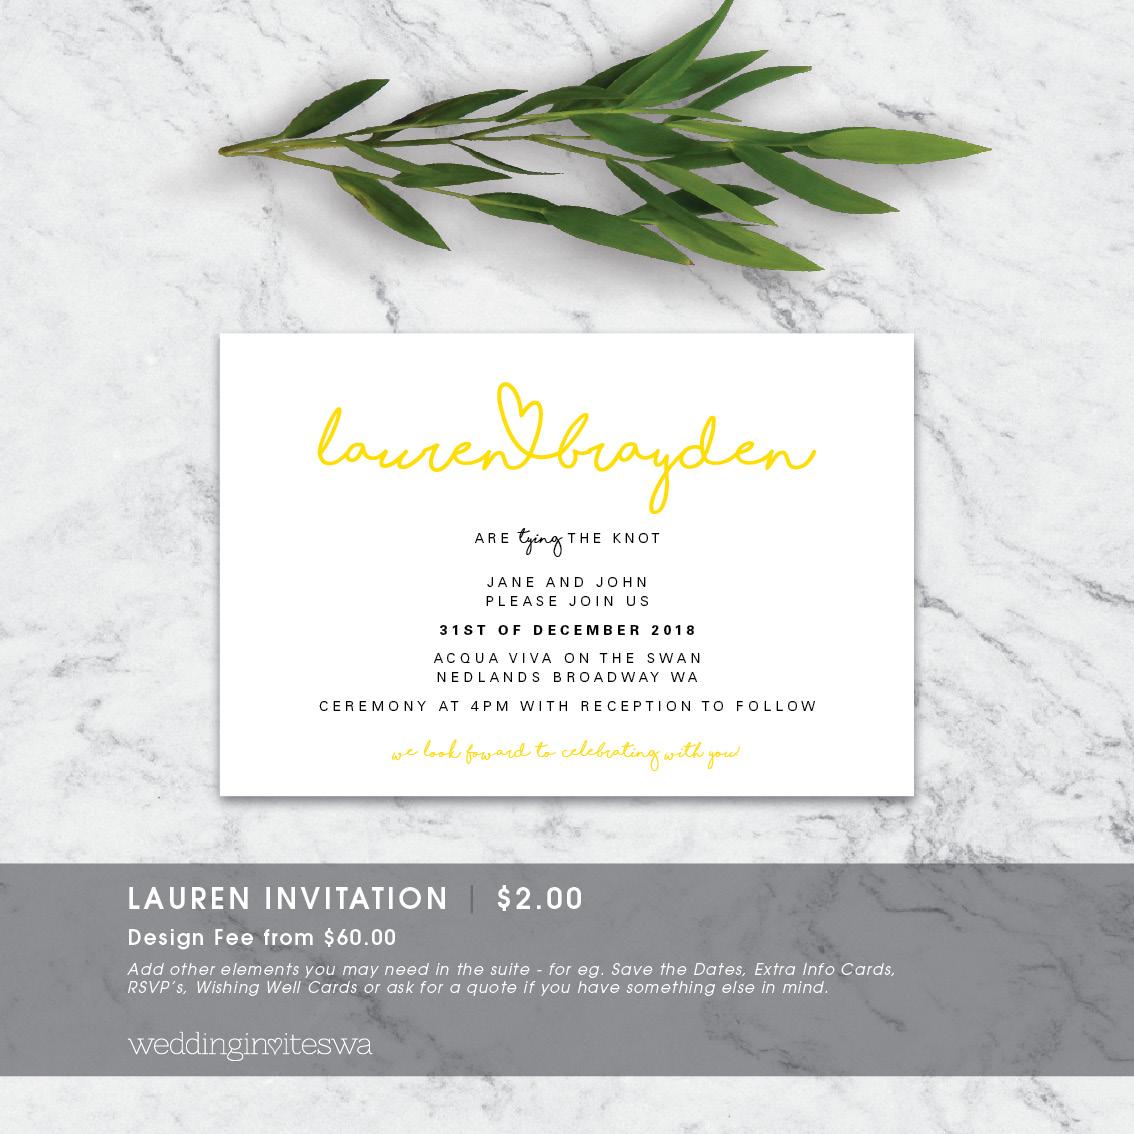 LAUREN_invite